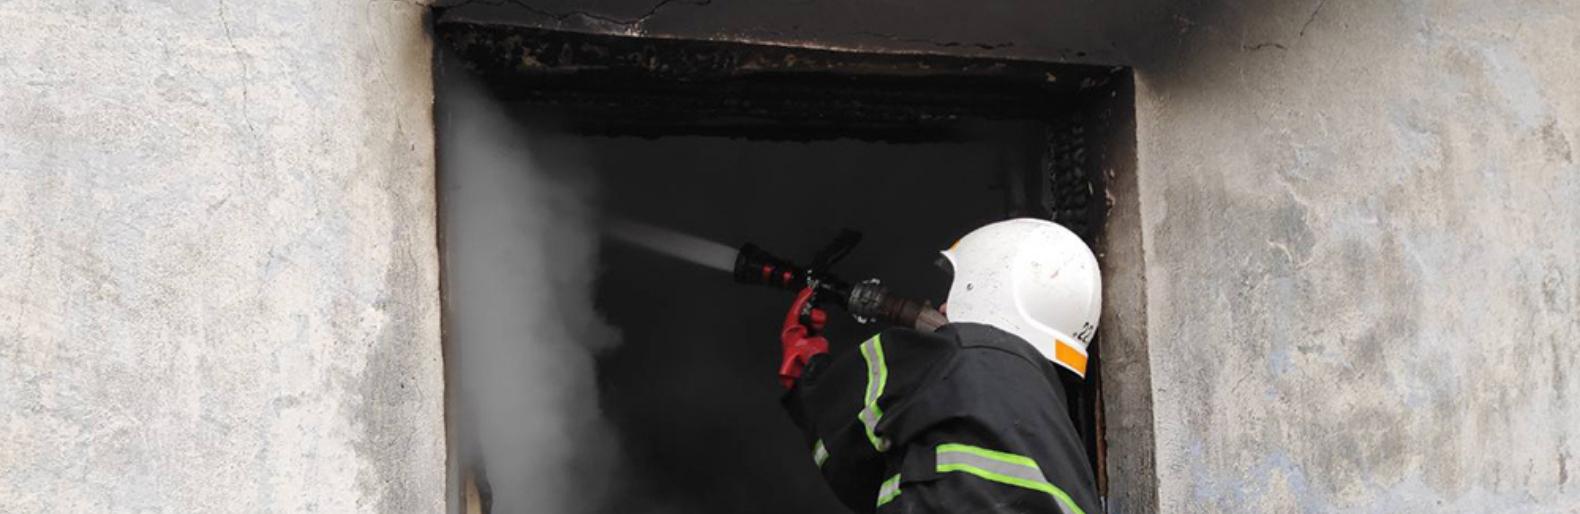 На Николаевщине во время пожара умер мужчина,- ФОТО